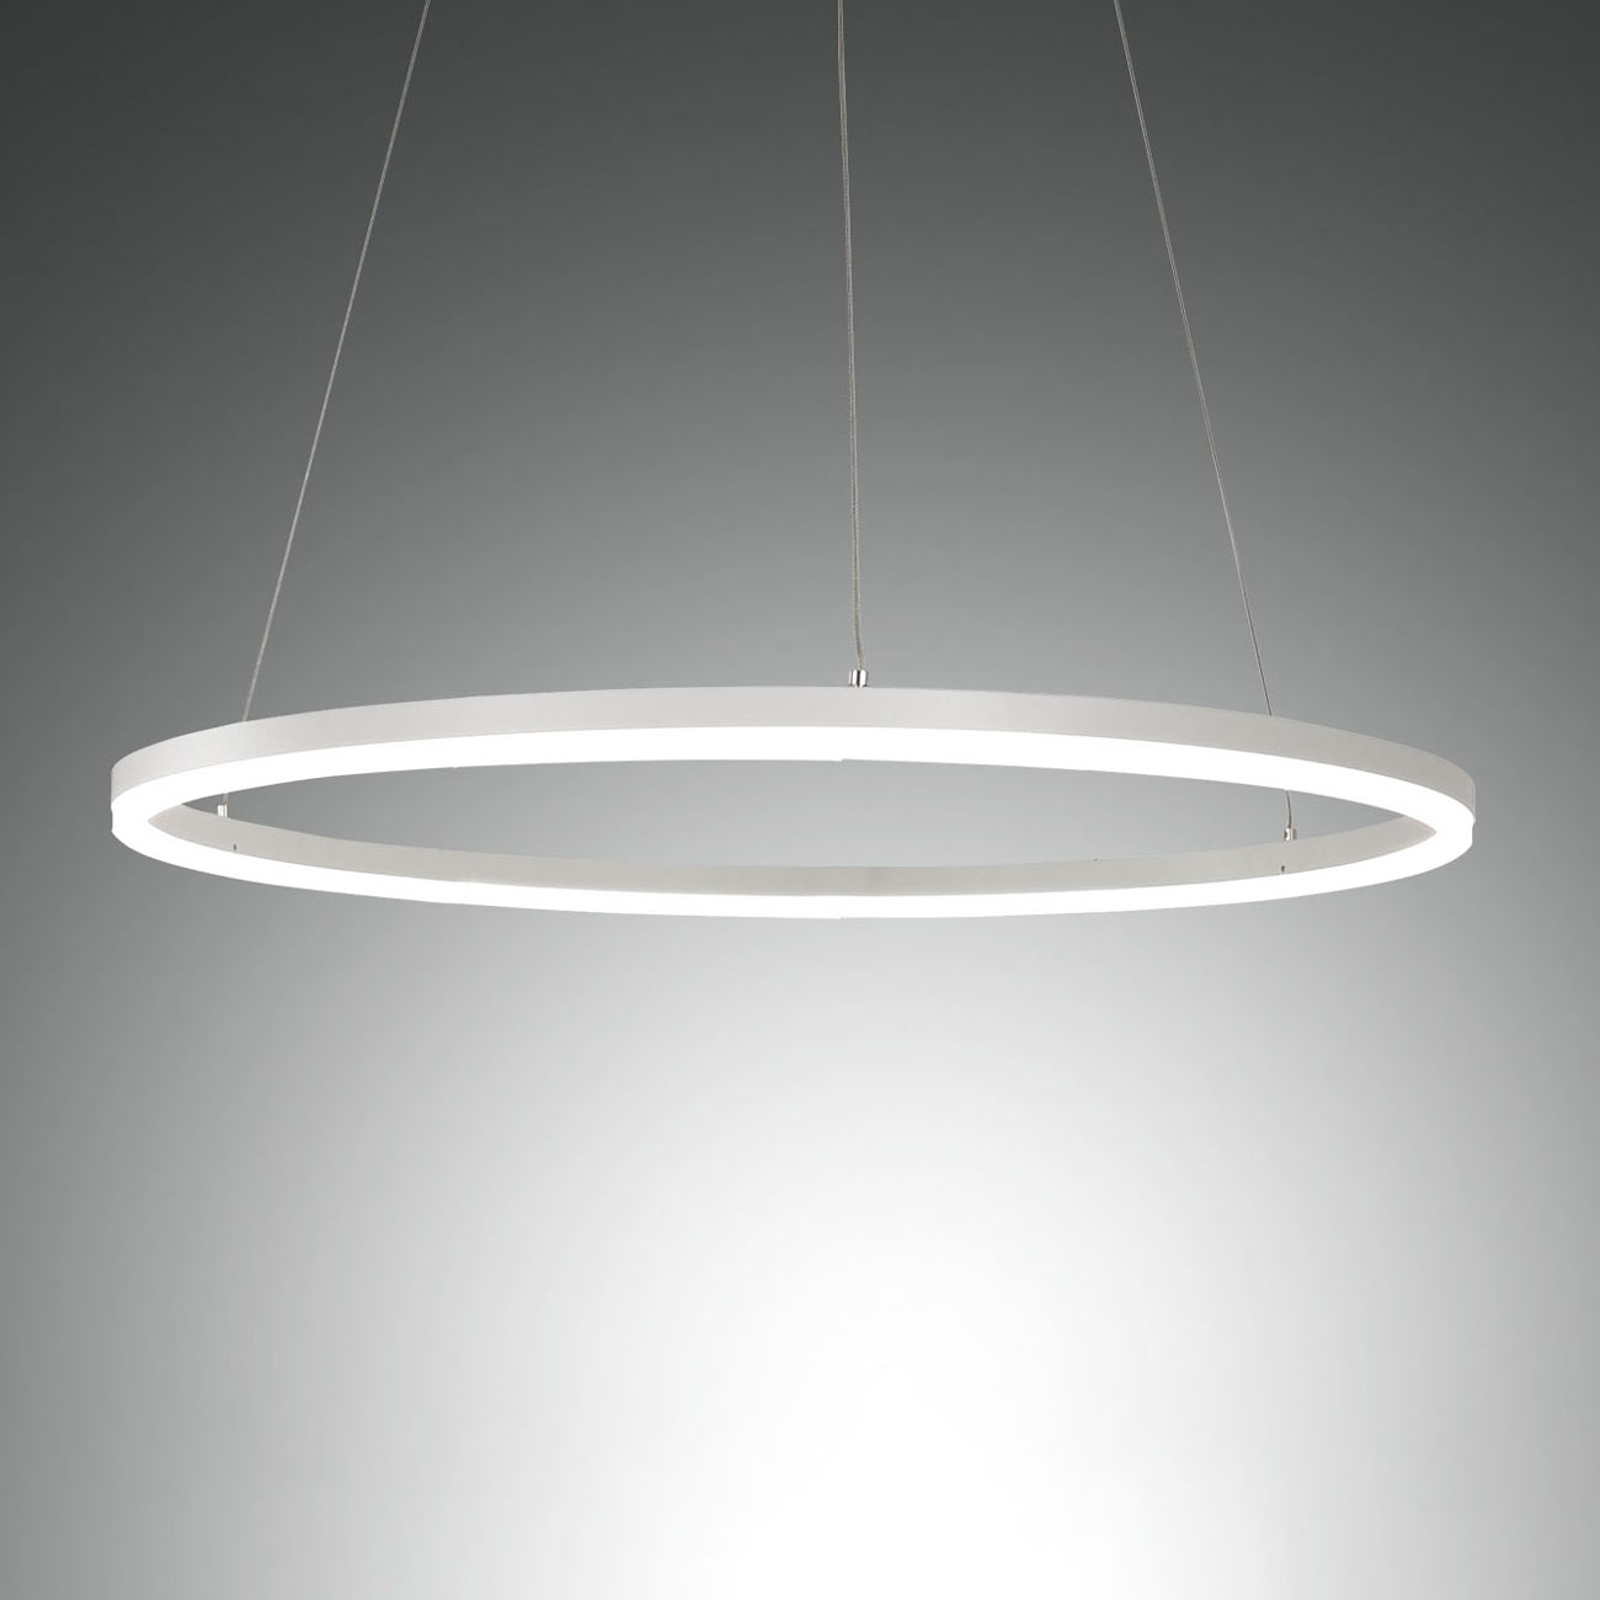 Giotto LED-pendellampe, 1 lyskilde, hvid